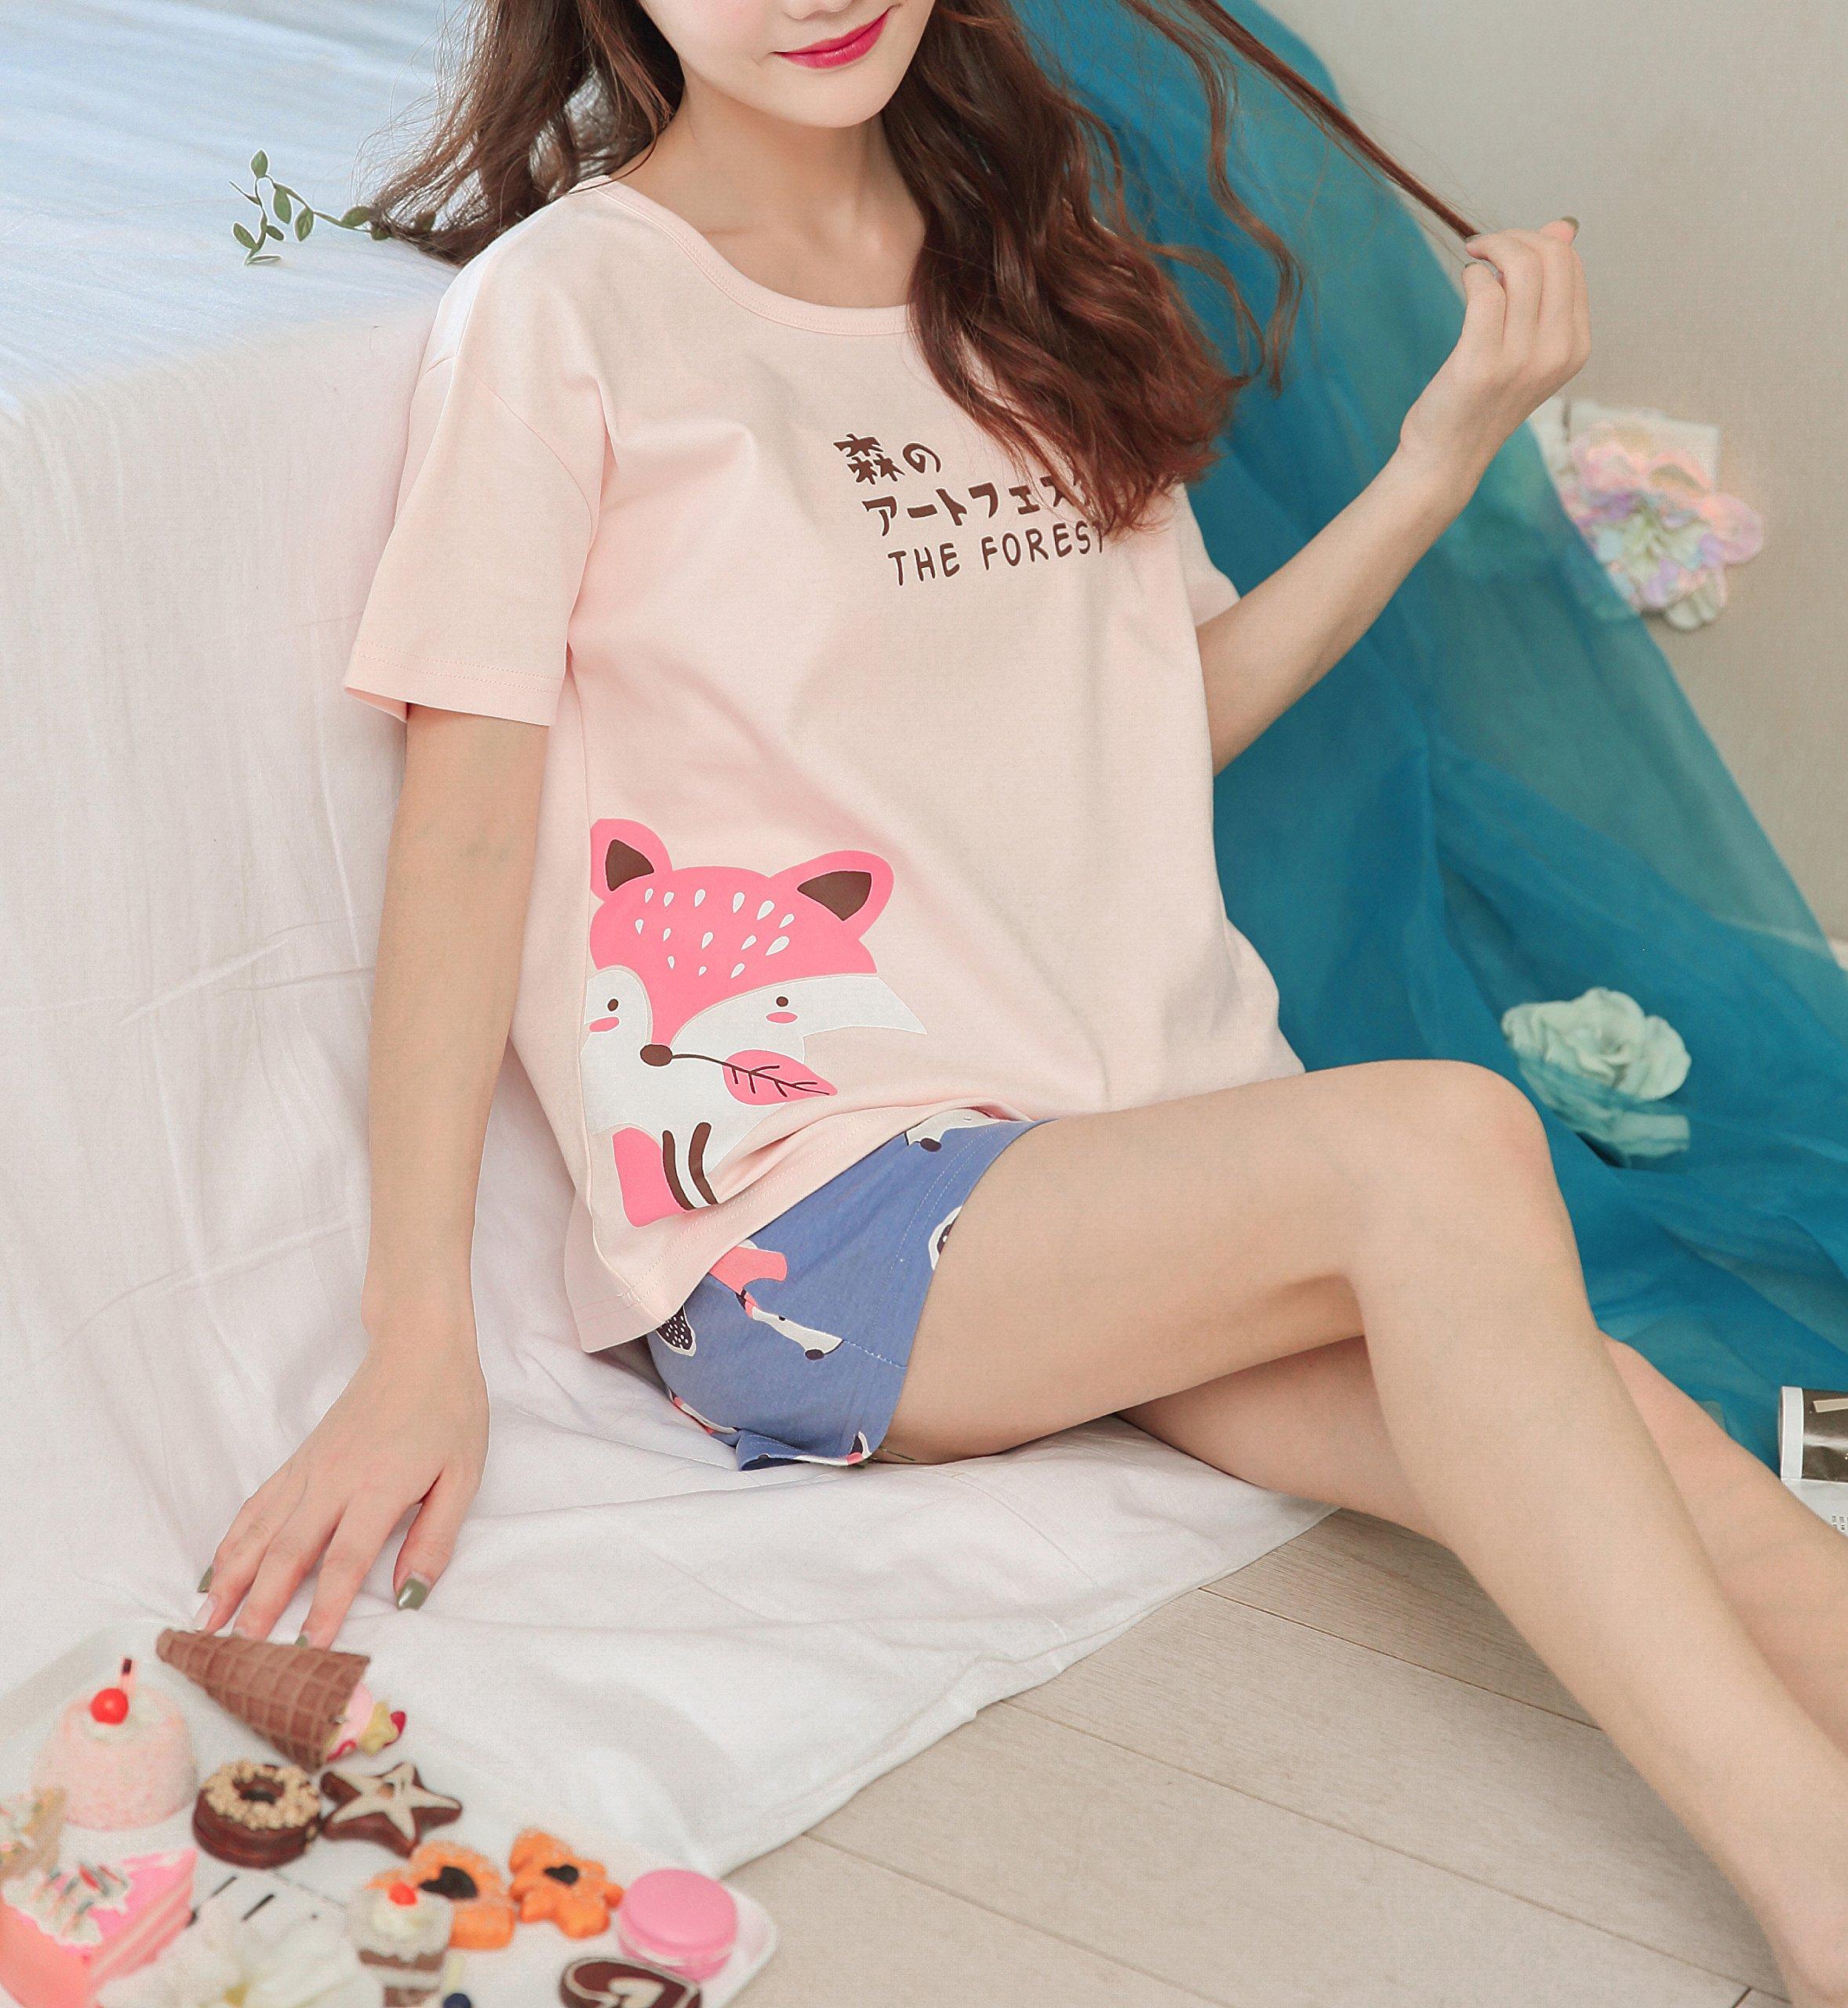 KINYBABY Big Girls Summer Pajama Set Cute Fox Printed Cotton Sleepwear Top&Shorts Pink Fox L by KINYBABY (Image #5)